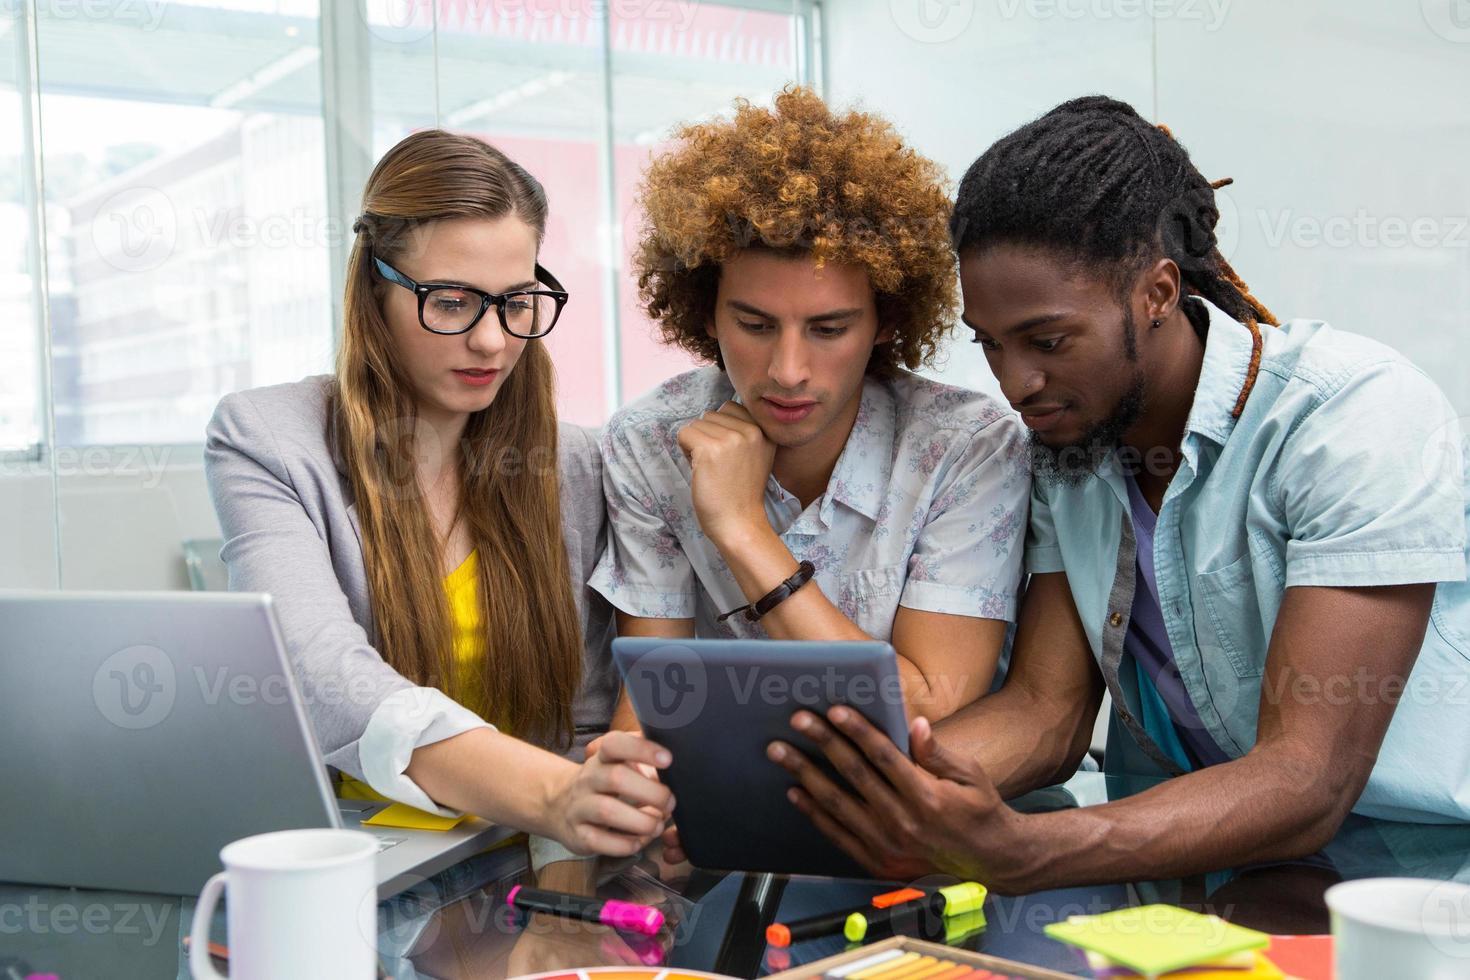 kreative Geschäftsleute, die digitales Tablett betrachten foto